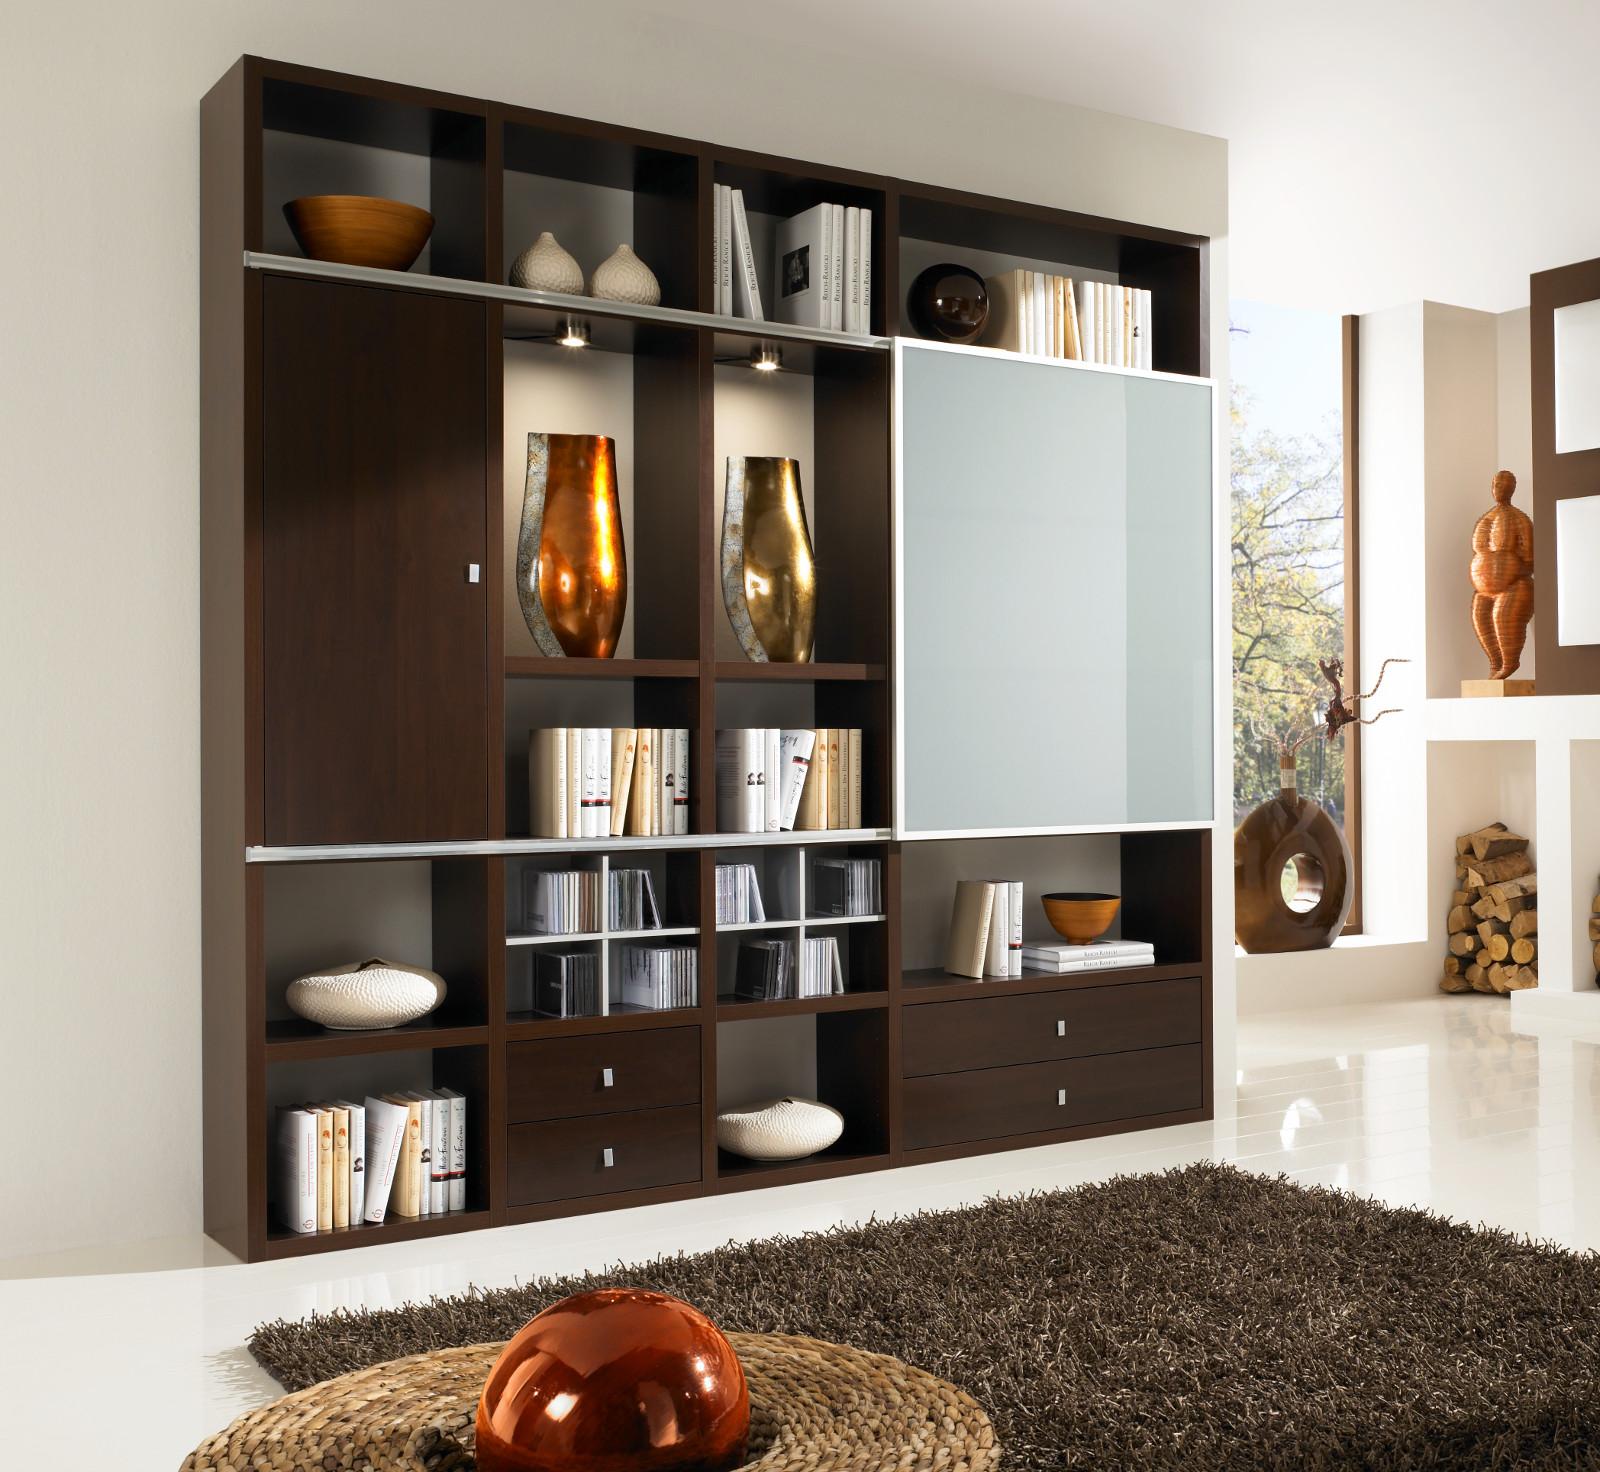 wohnwand modern g nstig interessante ideen. Black Bedroom Furniture Sets. Home Design Ideas